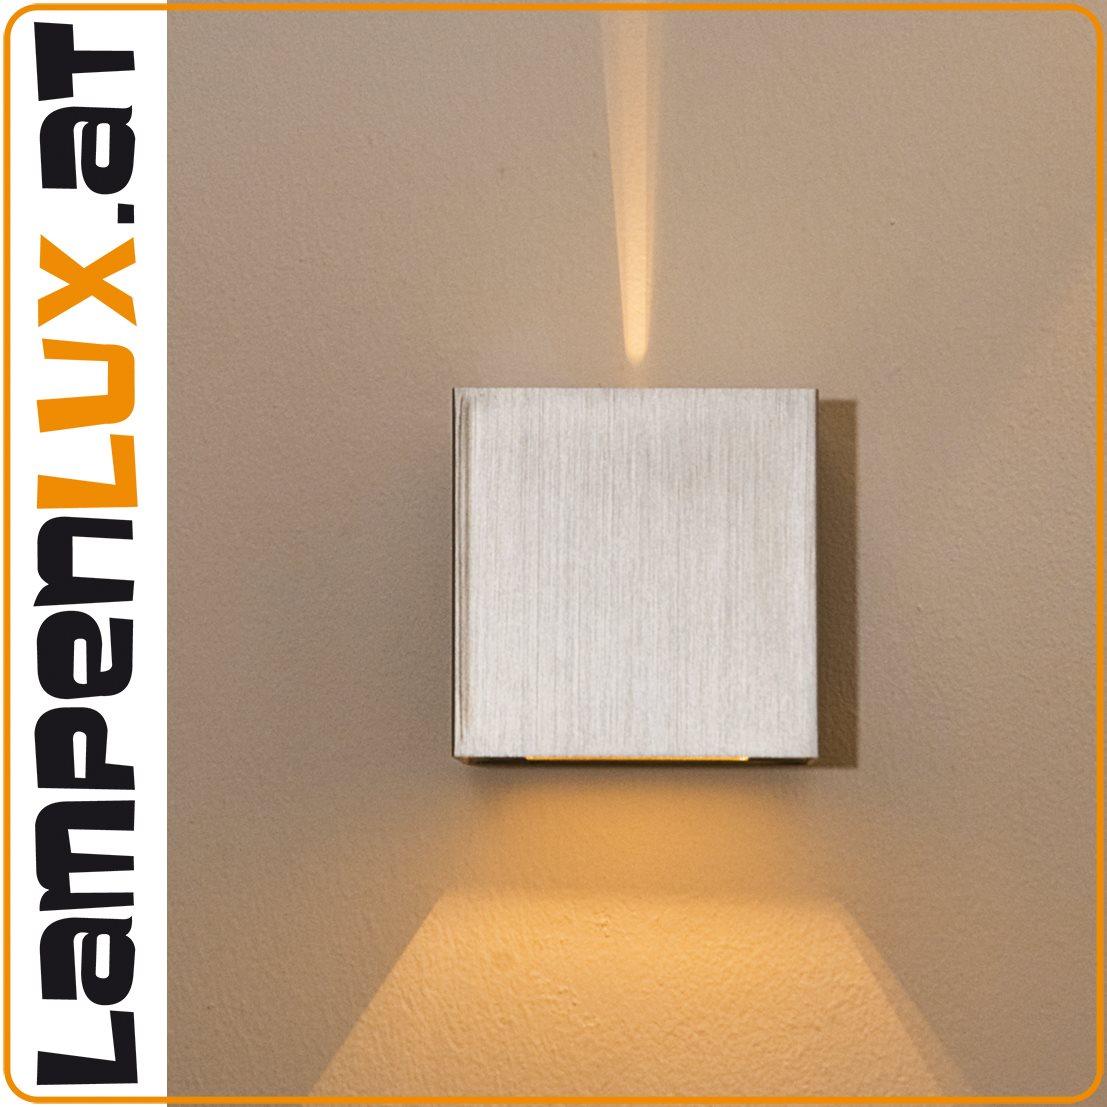 Lampenlux LED Wandlampe Amon Wandleuchte Effektlampe Eckig Up Down Nickel Aluminium